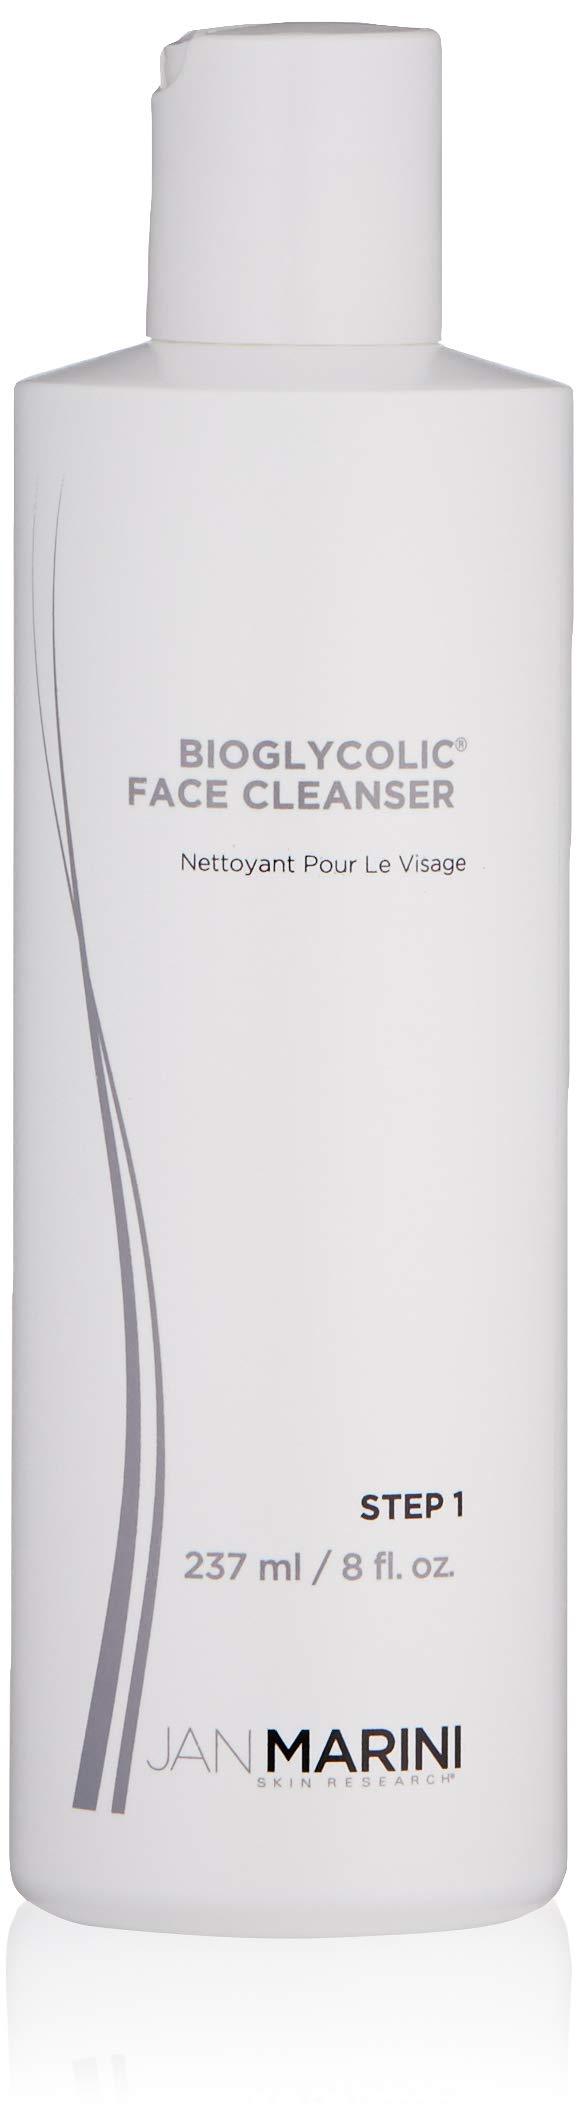 Jan Marini Skin Research Bioglycolic Face Cleanser, 8 fl. oz.